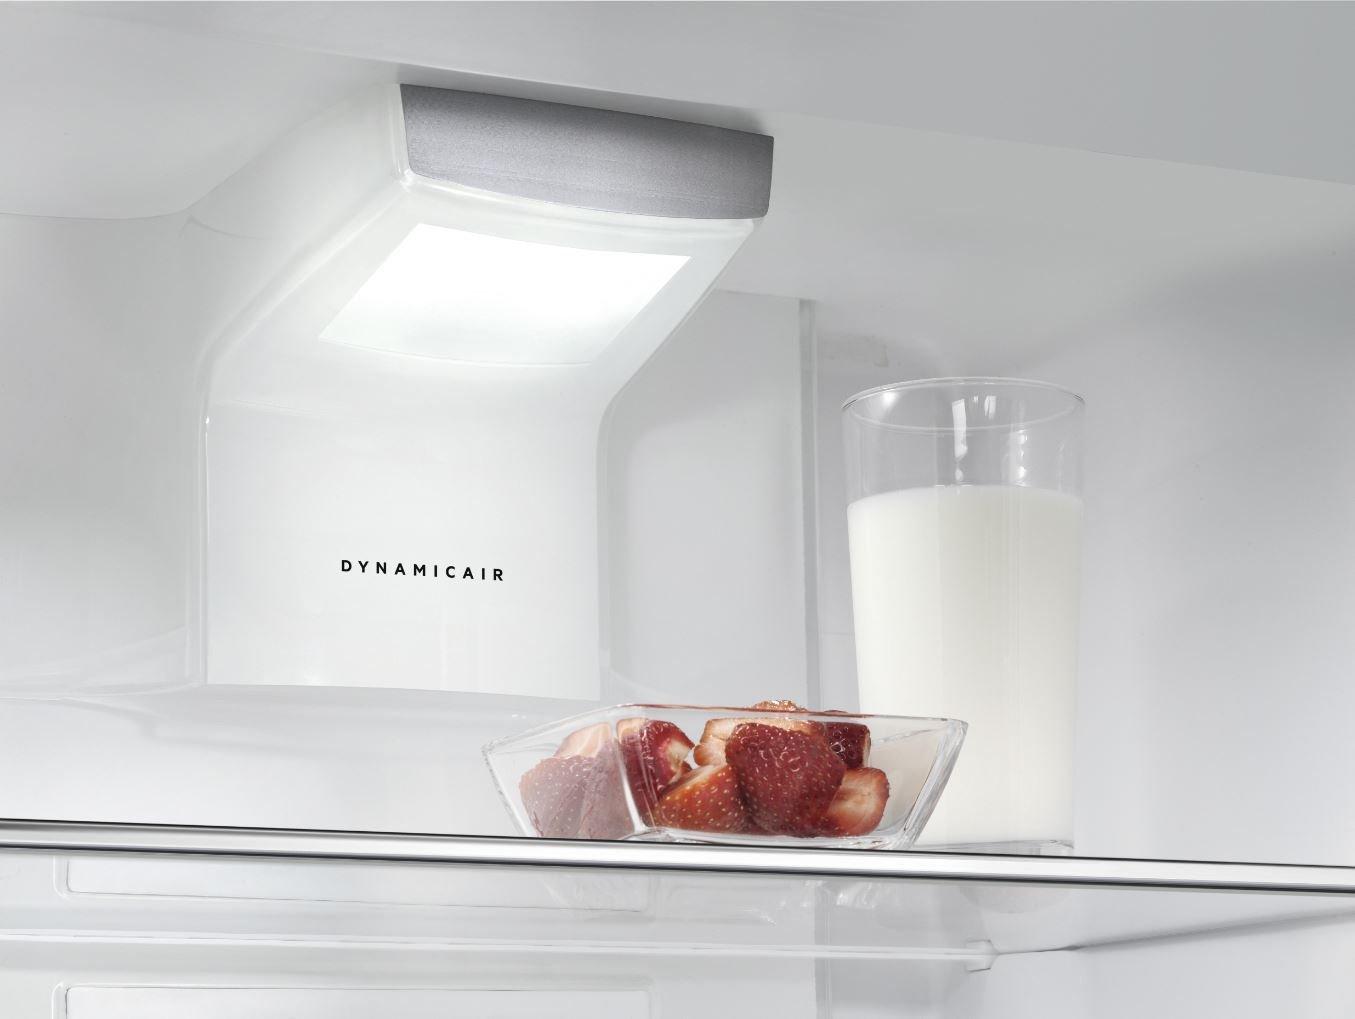 Bosch Kühlschrank Alarm Leuchtet : Aeg ske zc kühlschrank vollintegrierbar weiß a amazon